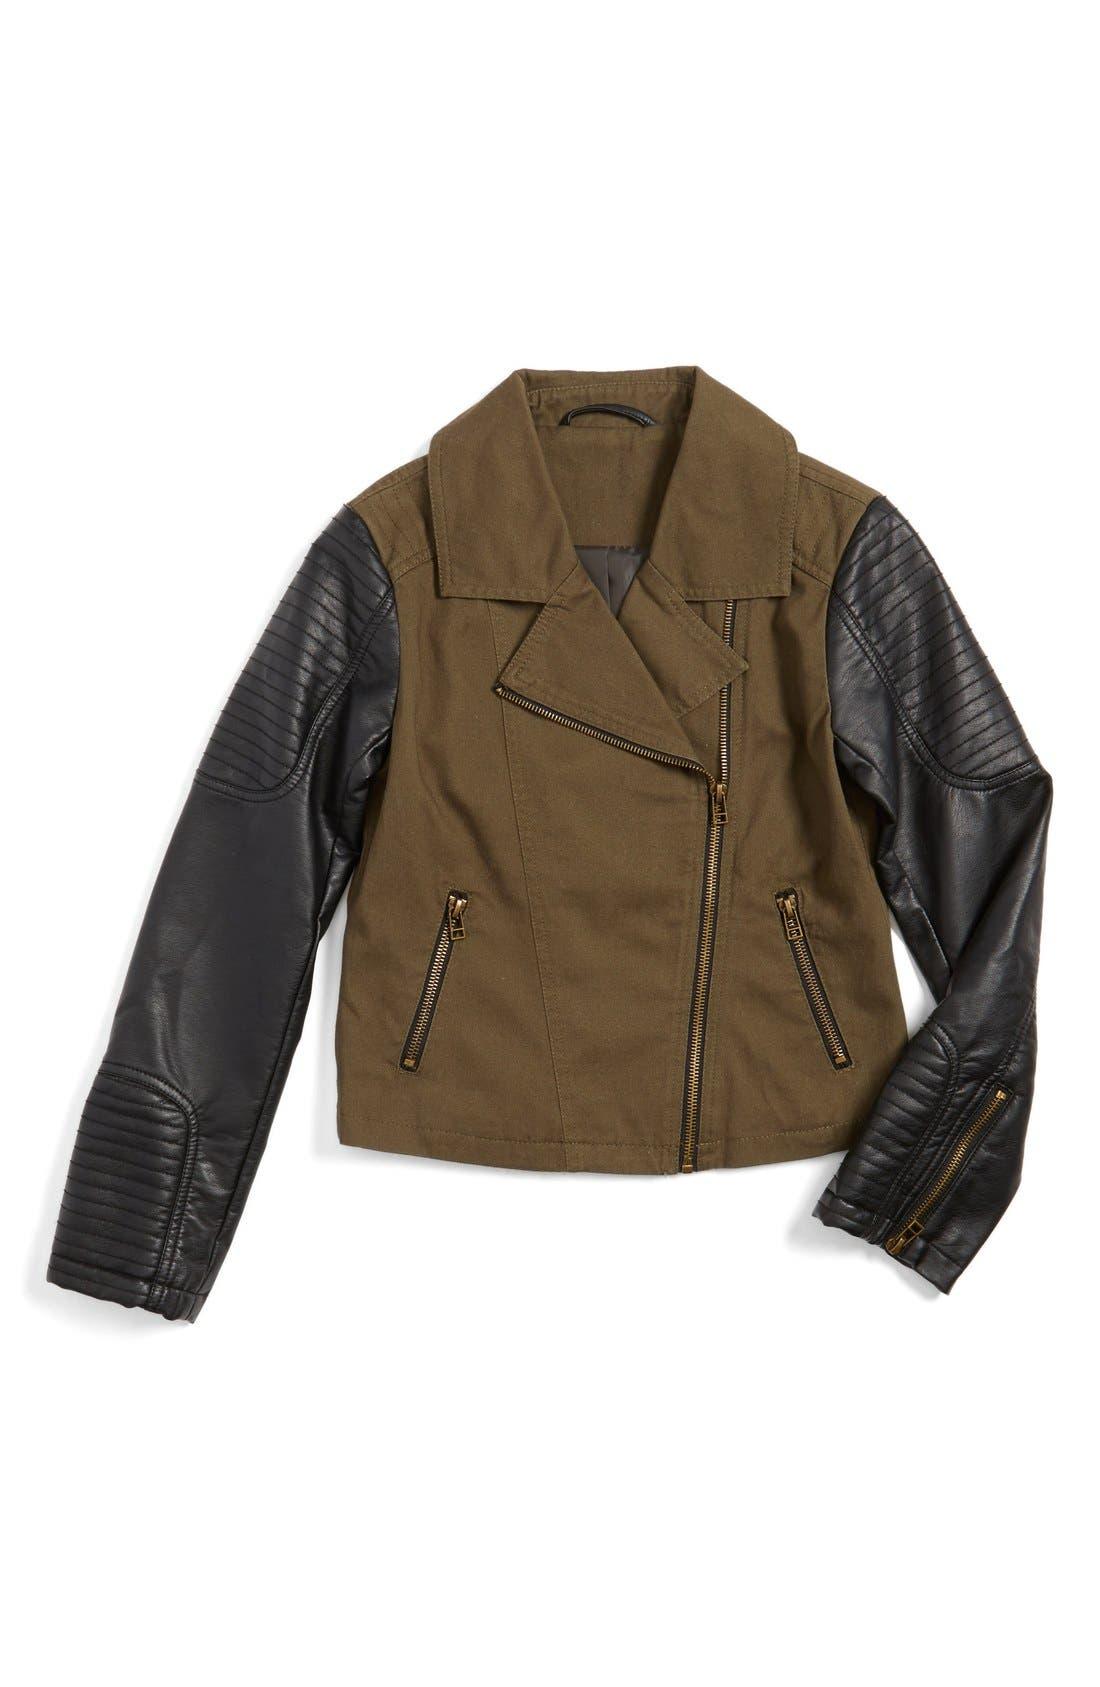 Alternate Image 1 Selected - CoffeeShop Kids Moto Jacket (Big Girls)